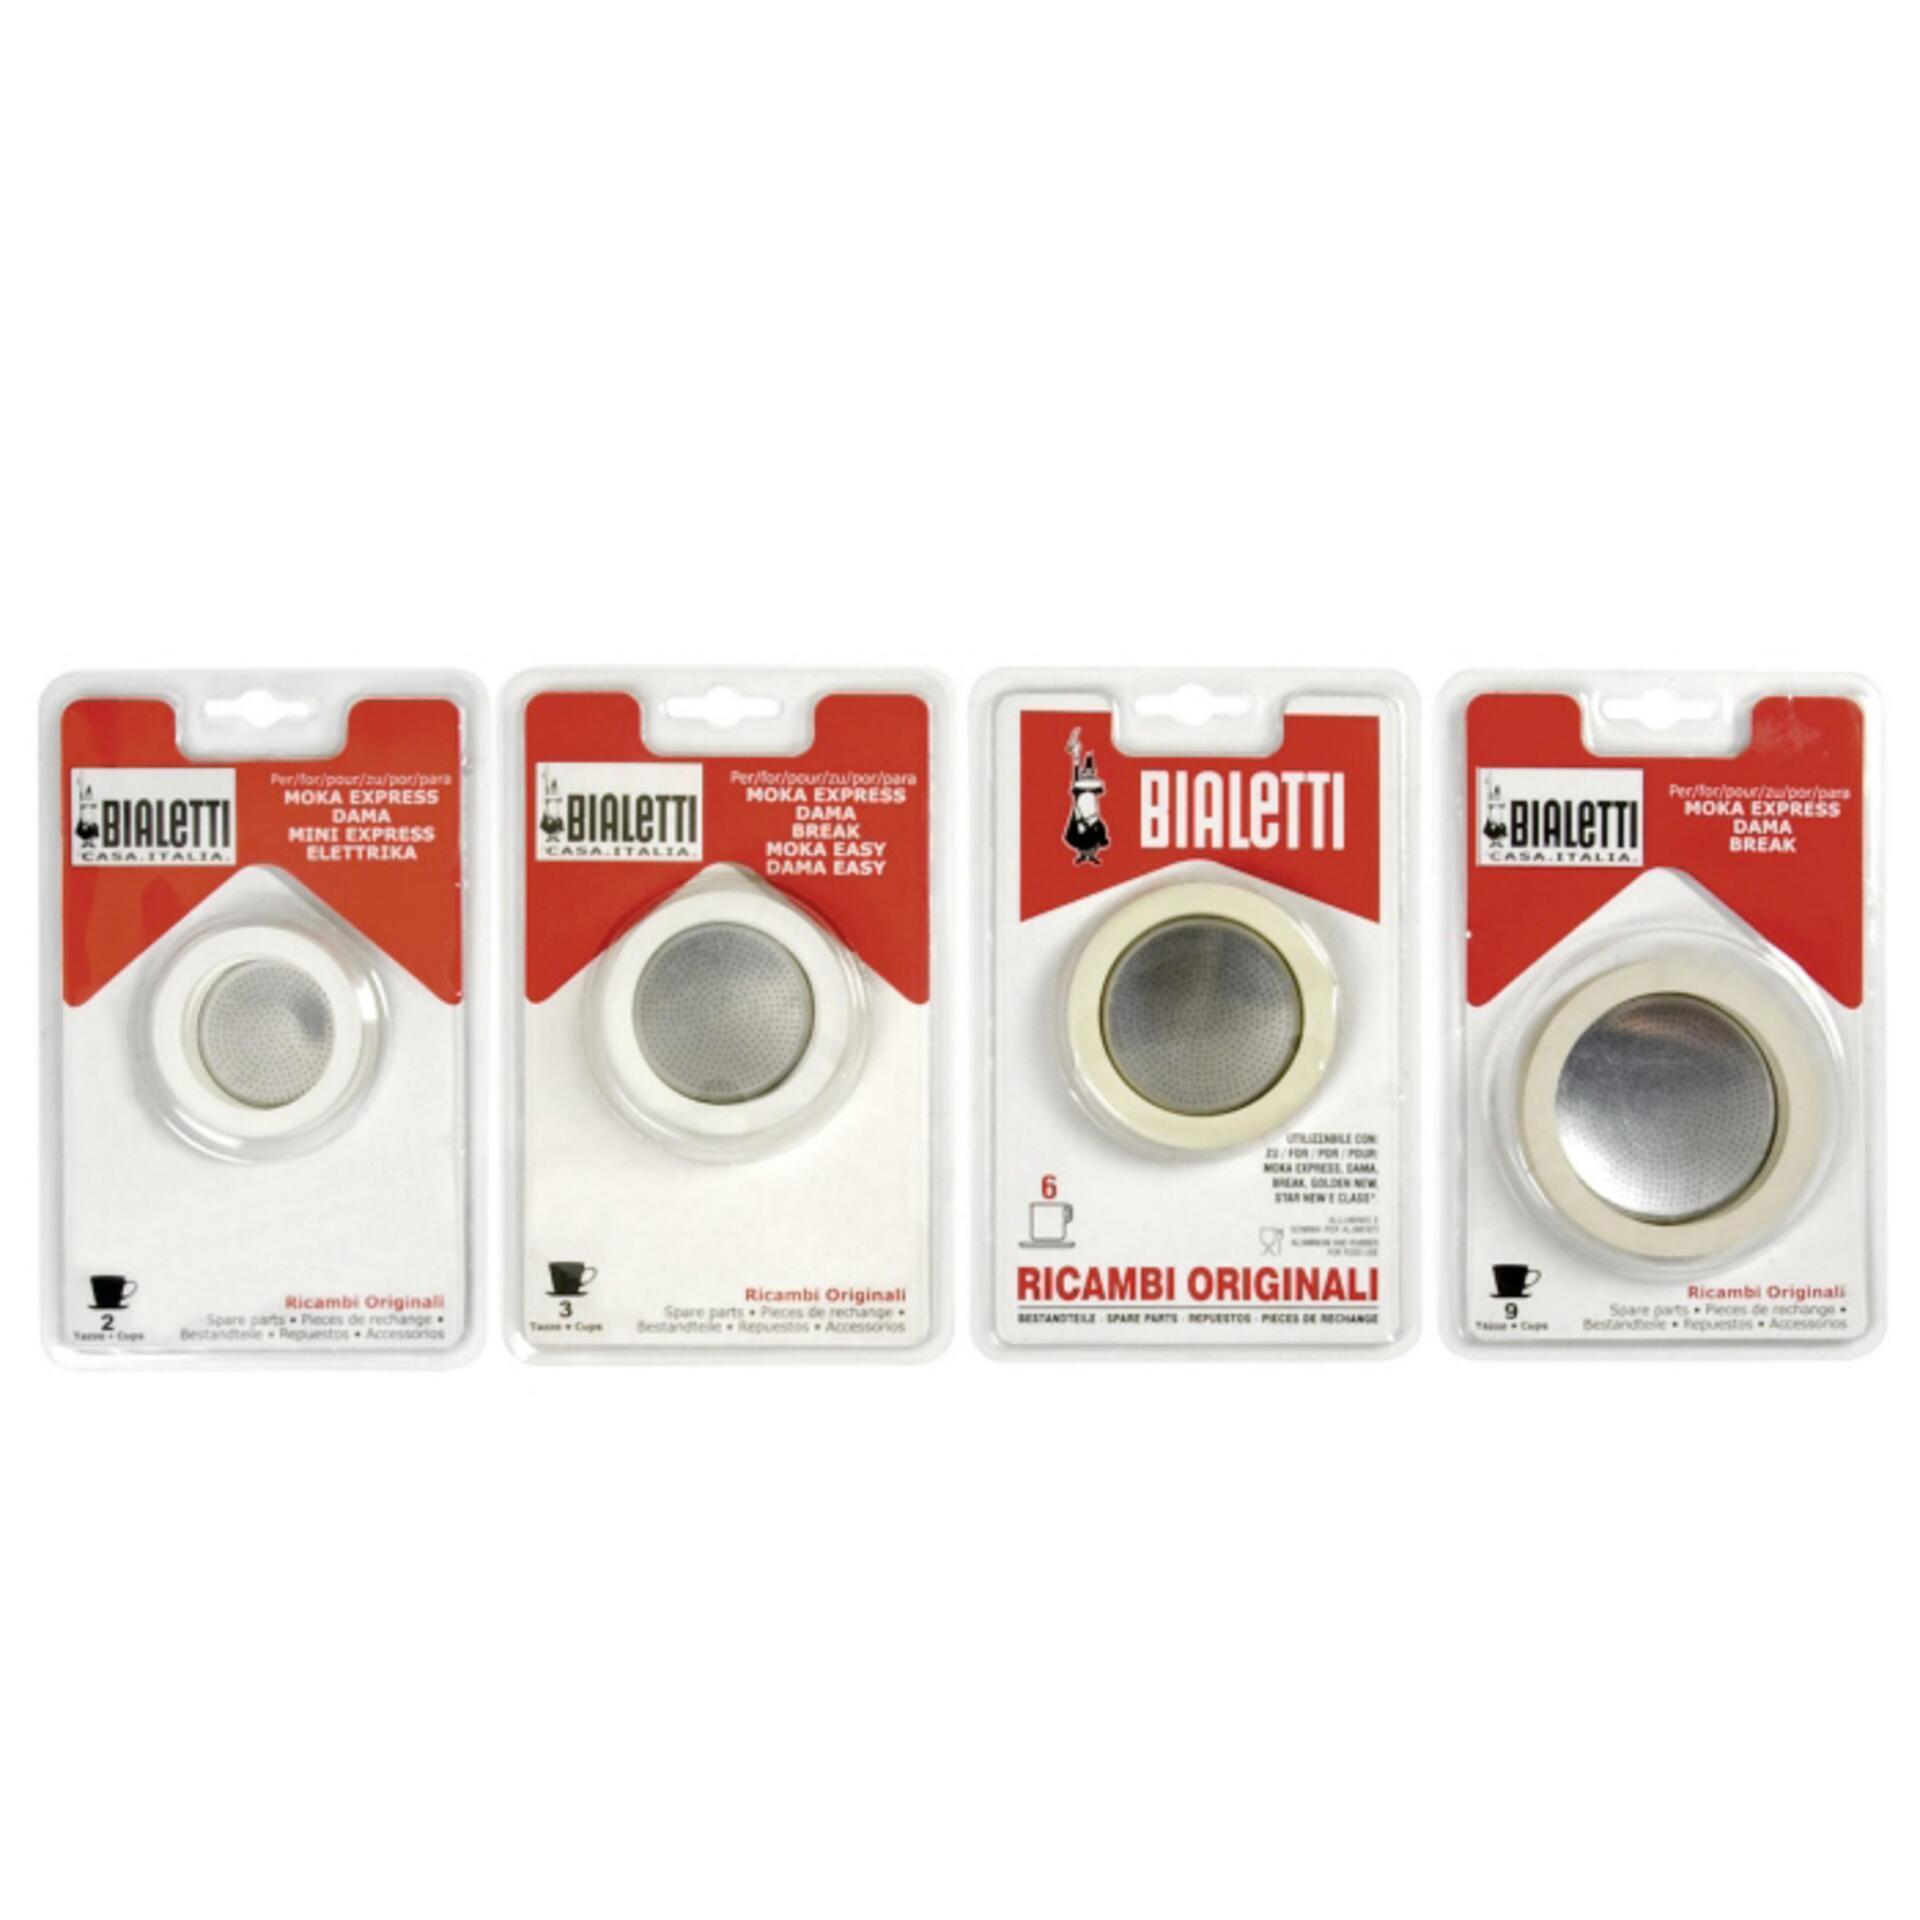 Bialetti Gummidichtung und Filter Aluminiummaschinen 9 Tassen